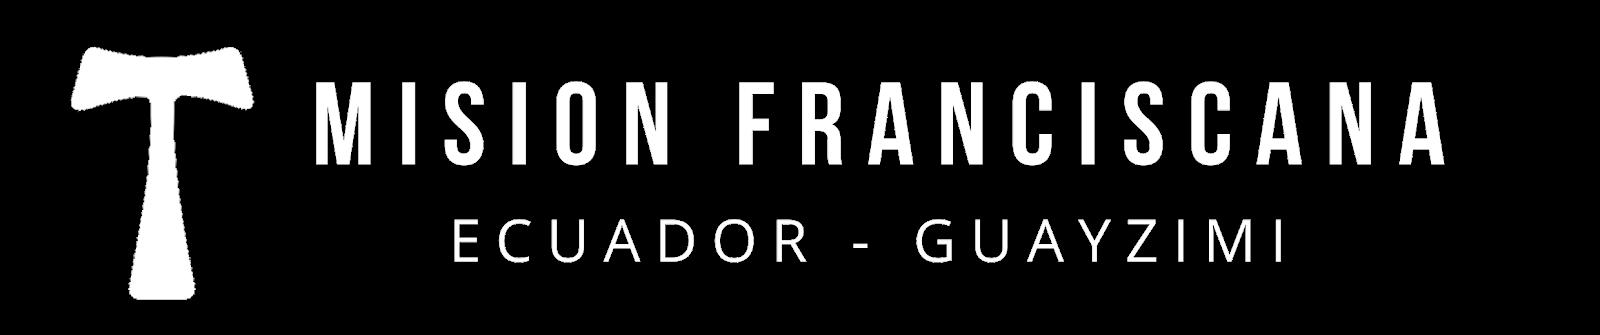 Mision Franciscana Ecuador - Guayzimi